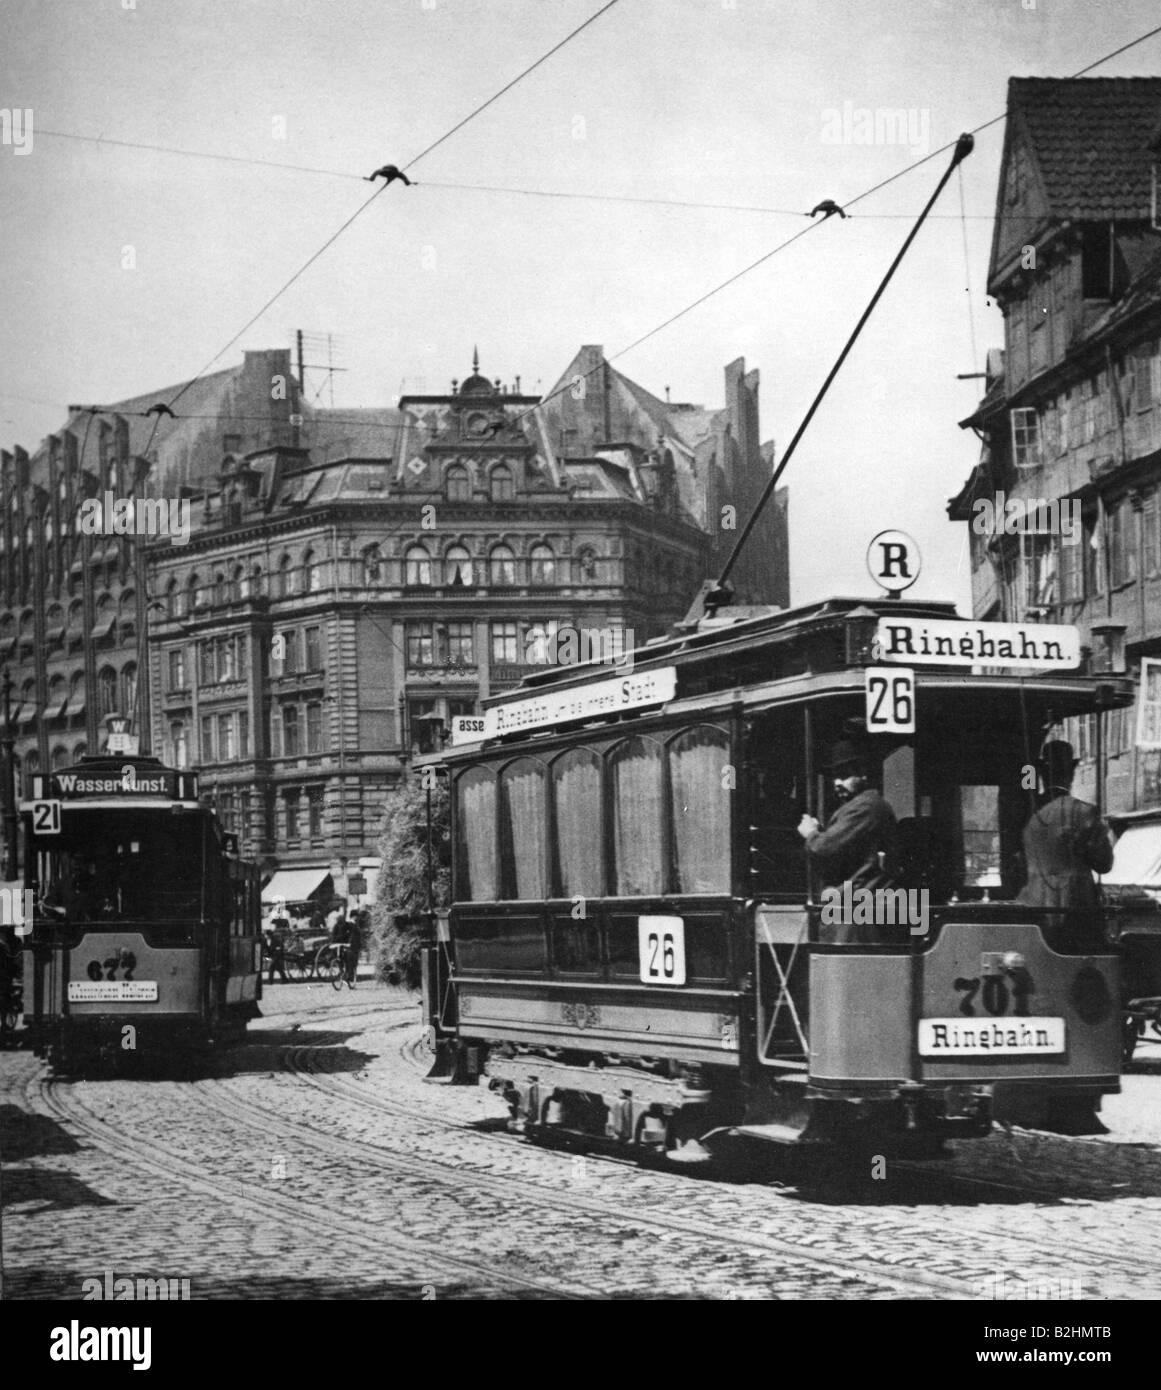 transport/transportation, public transportation, tram, circle line ...